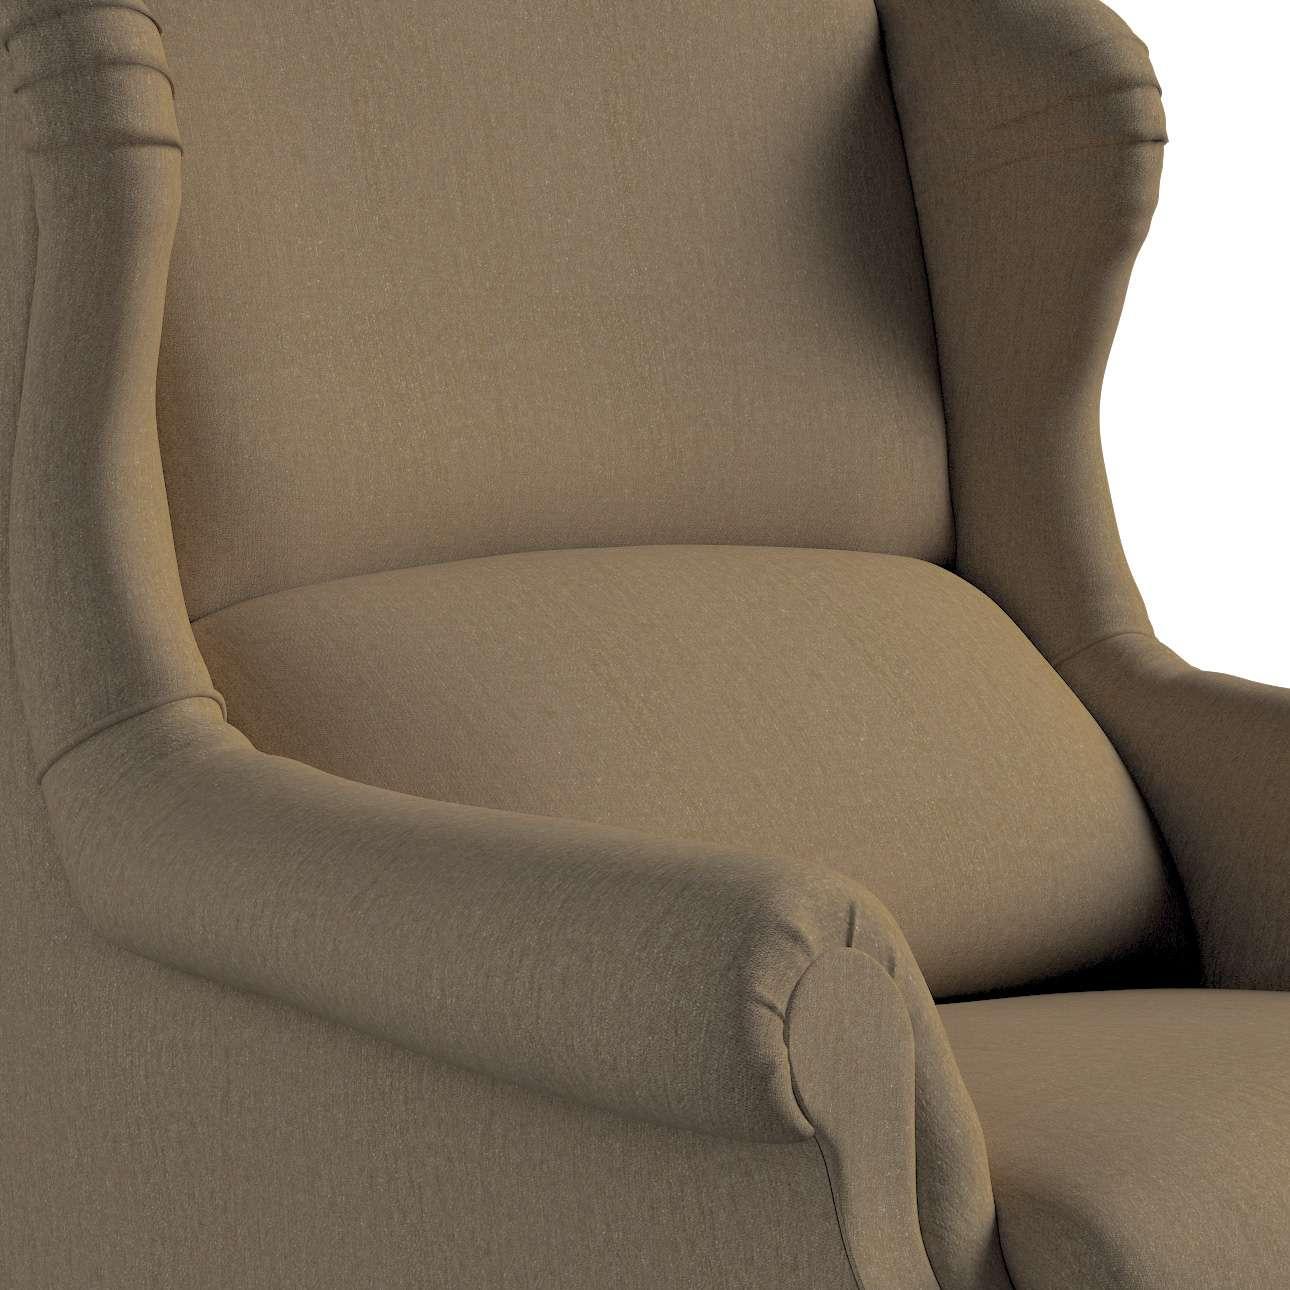 Fotel Unique w kolekcji Chenille, tkanina: 702-21